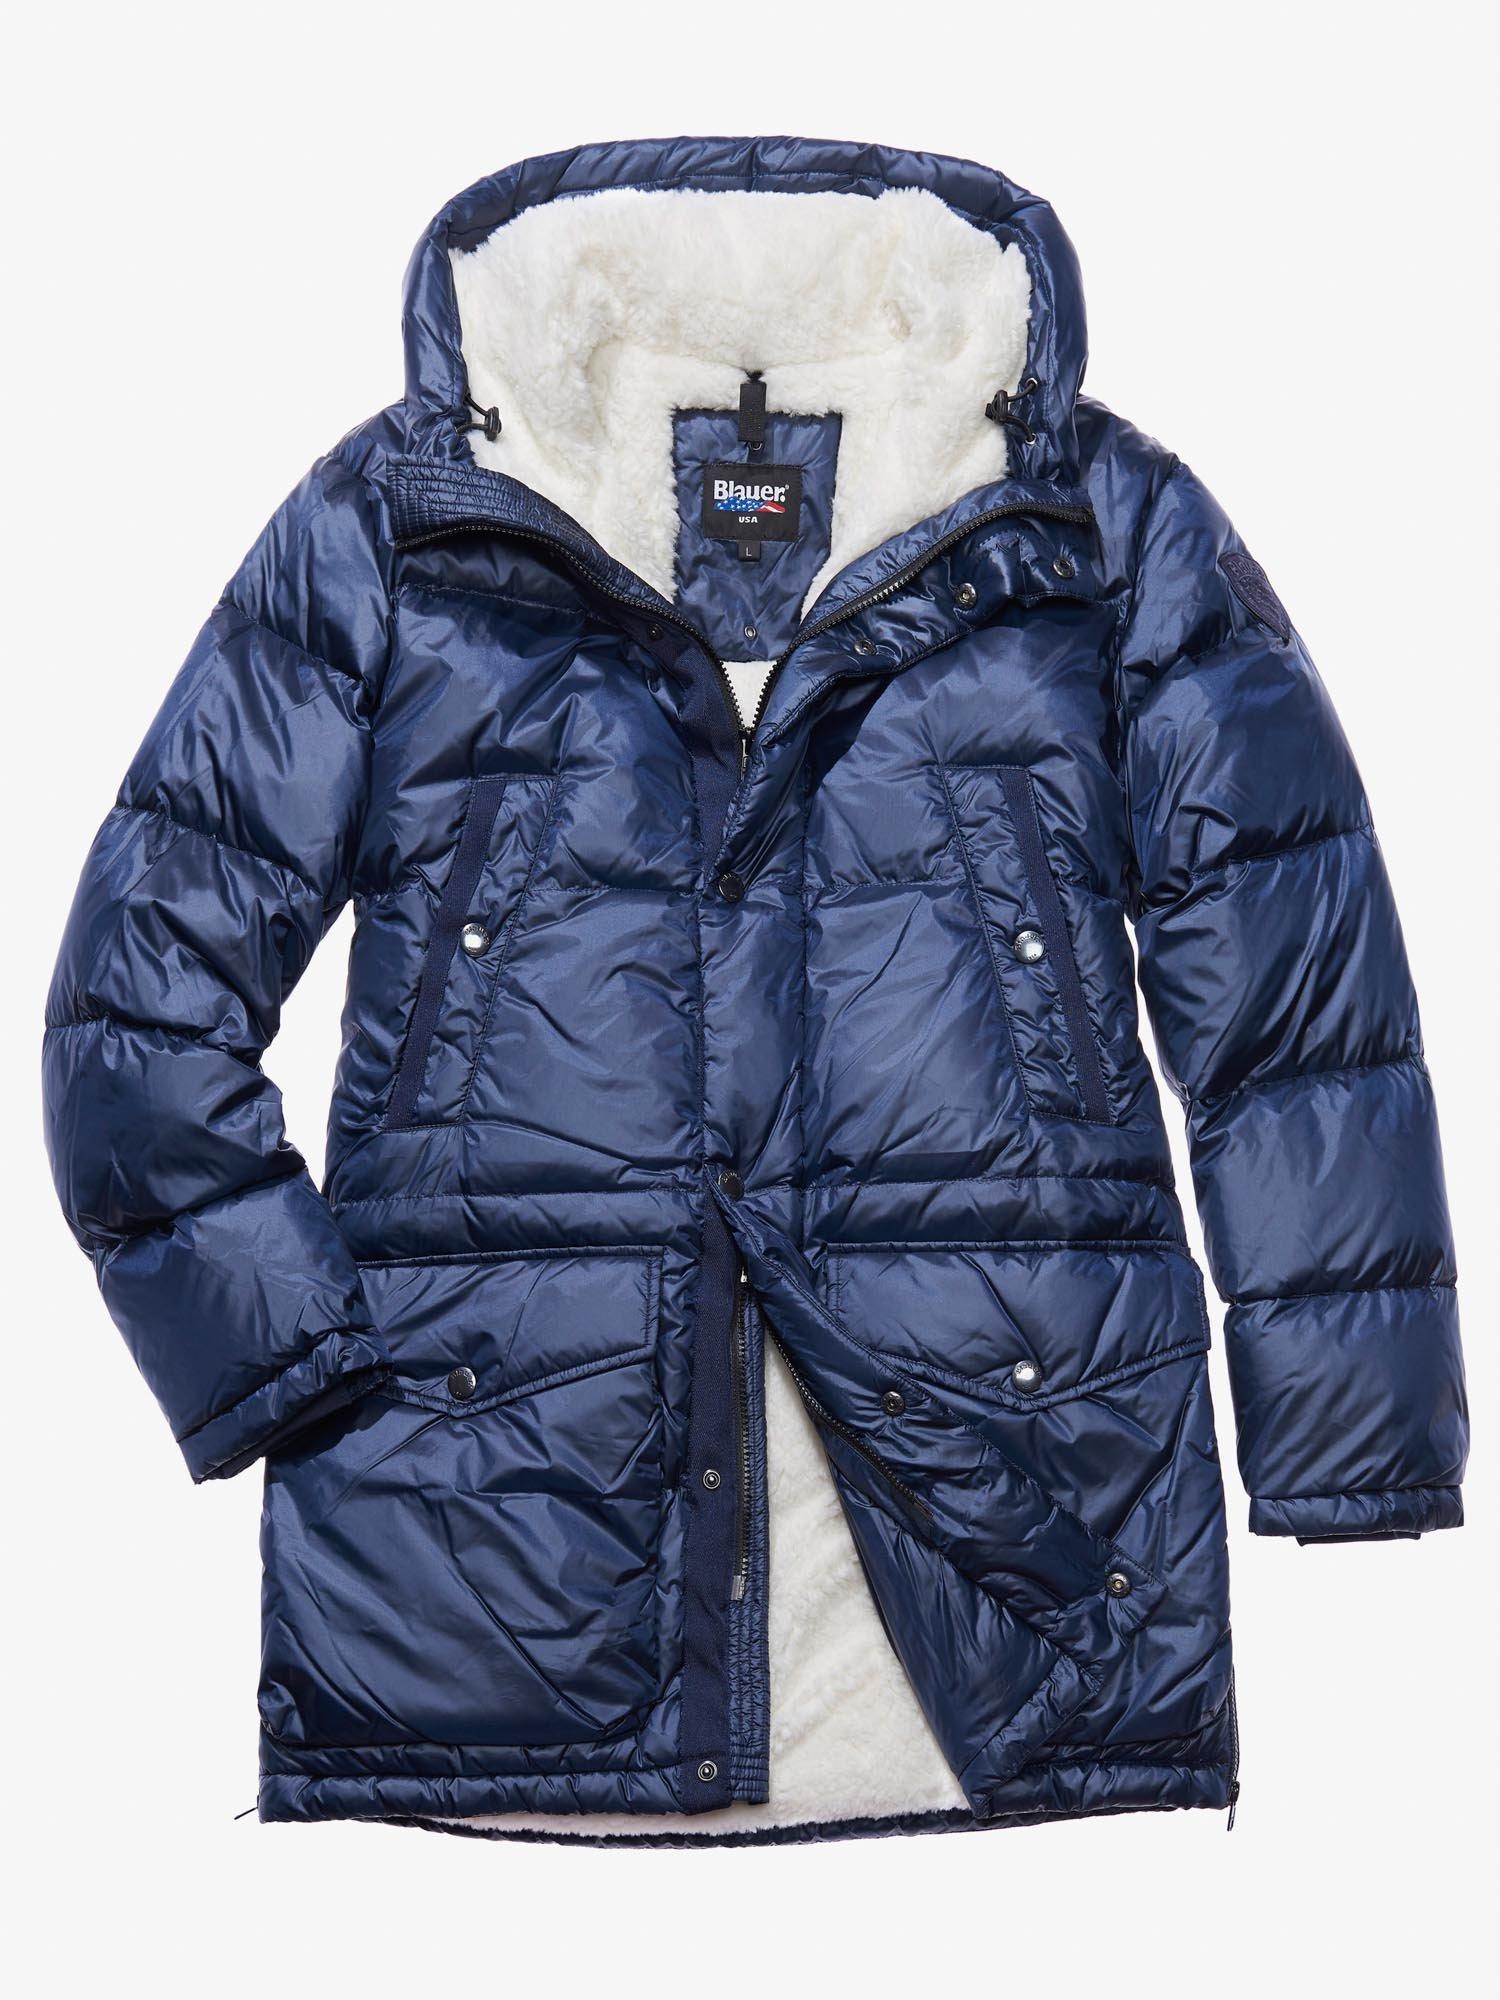 Blauer - LEONARDO DOWN COAT WITH FAUX FUR LINING - blue - Blauer